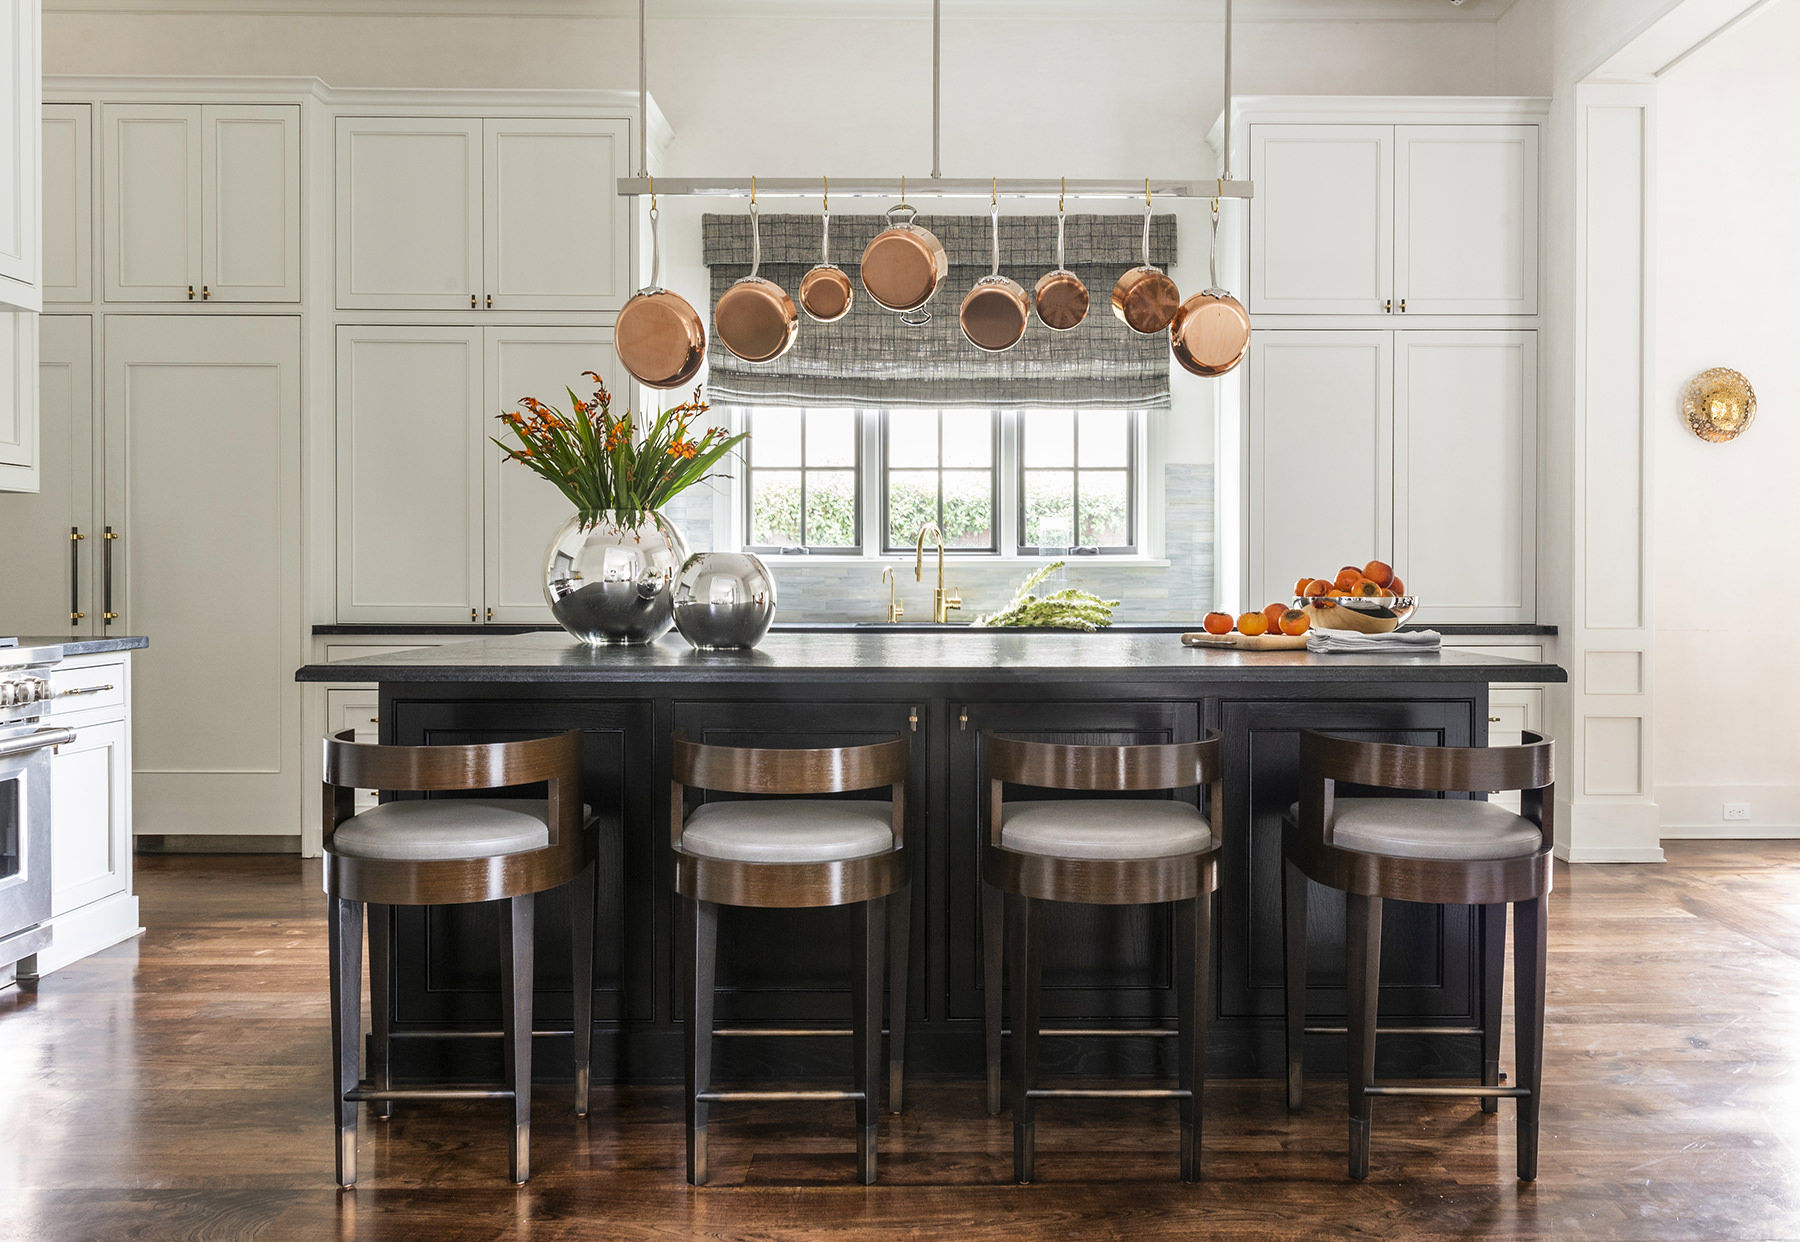 elegant kitchen bar with orange floral accents